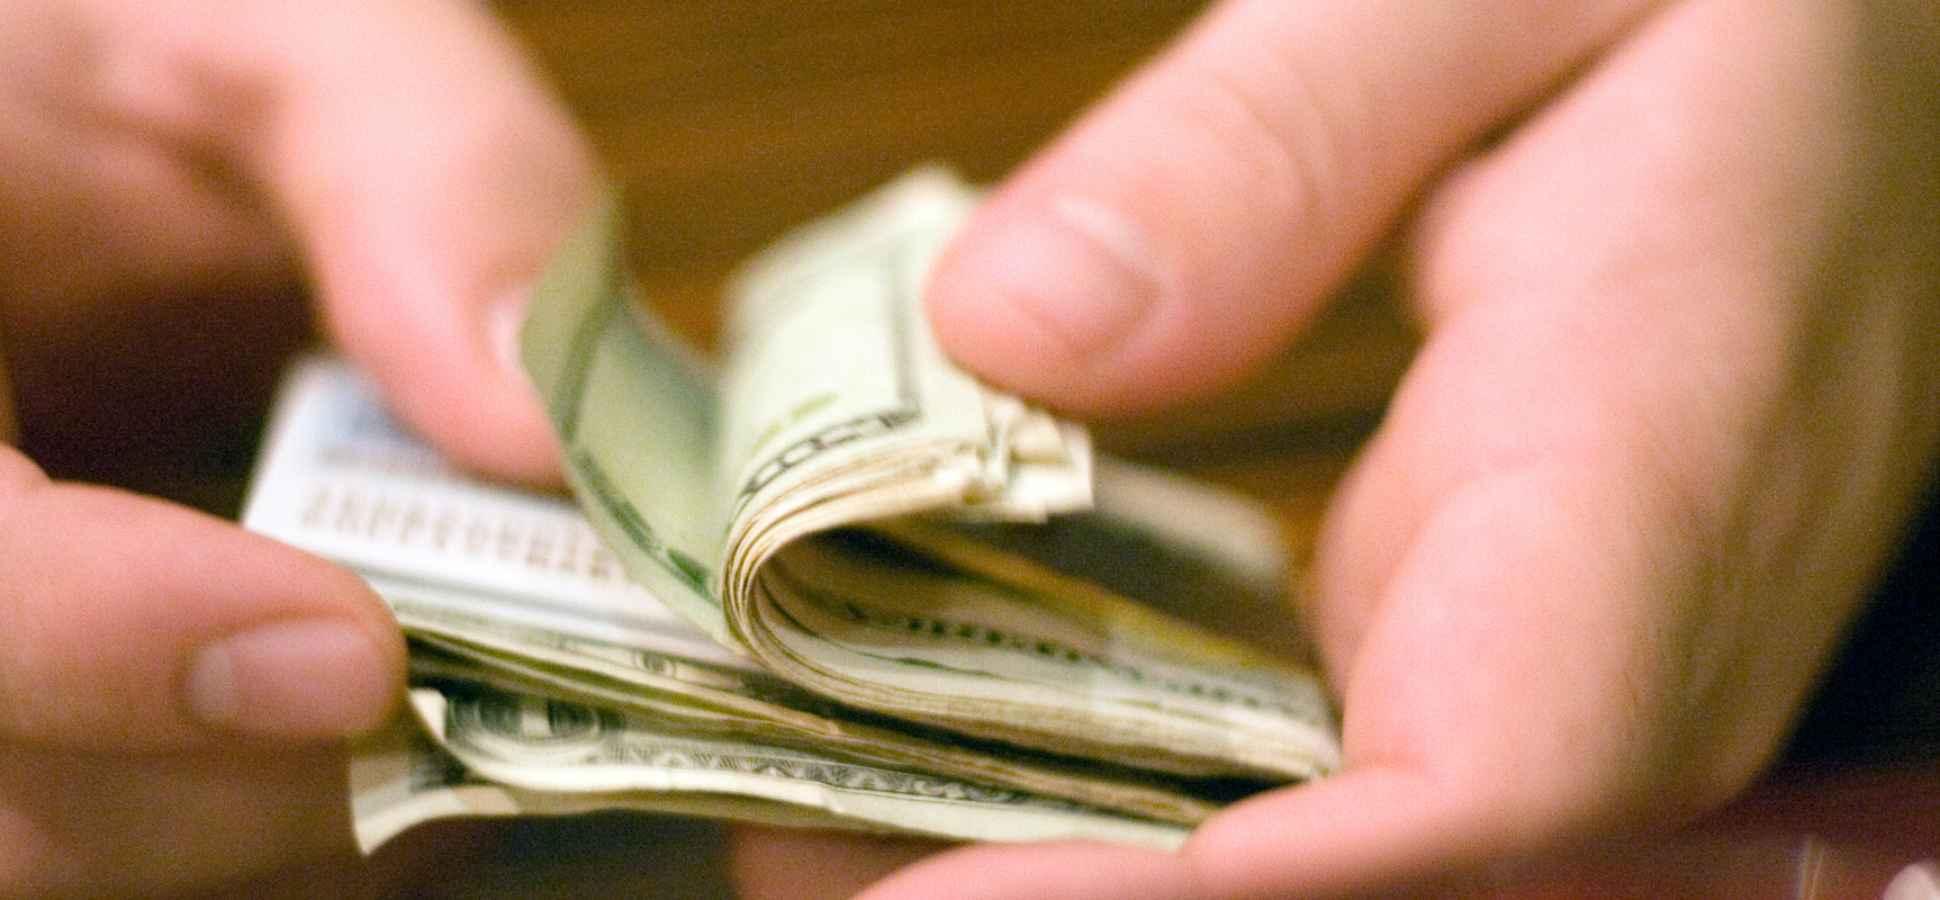 Why You Shouldn't Raise VC Money